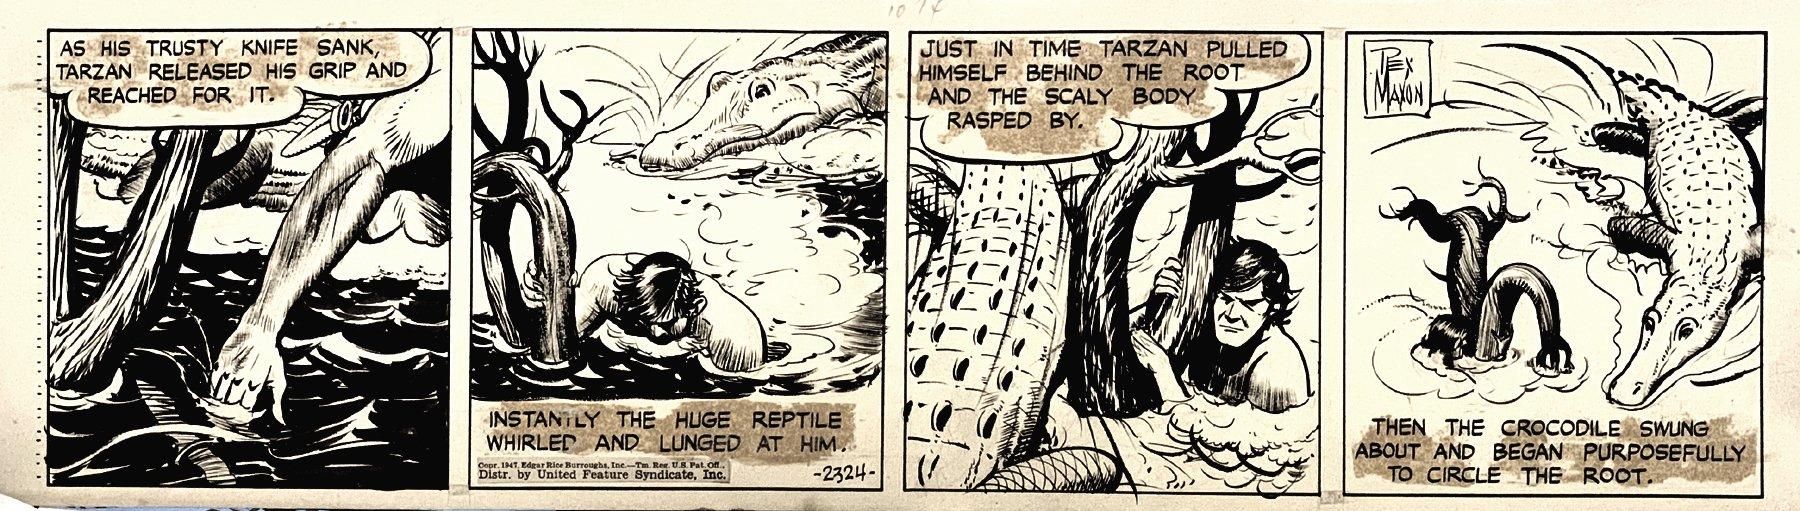 Tarzan Daily Strip 2324 (TARZAN BATTLING CROCODILE IN EVERY PANEL!) 1947